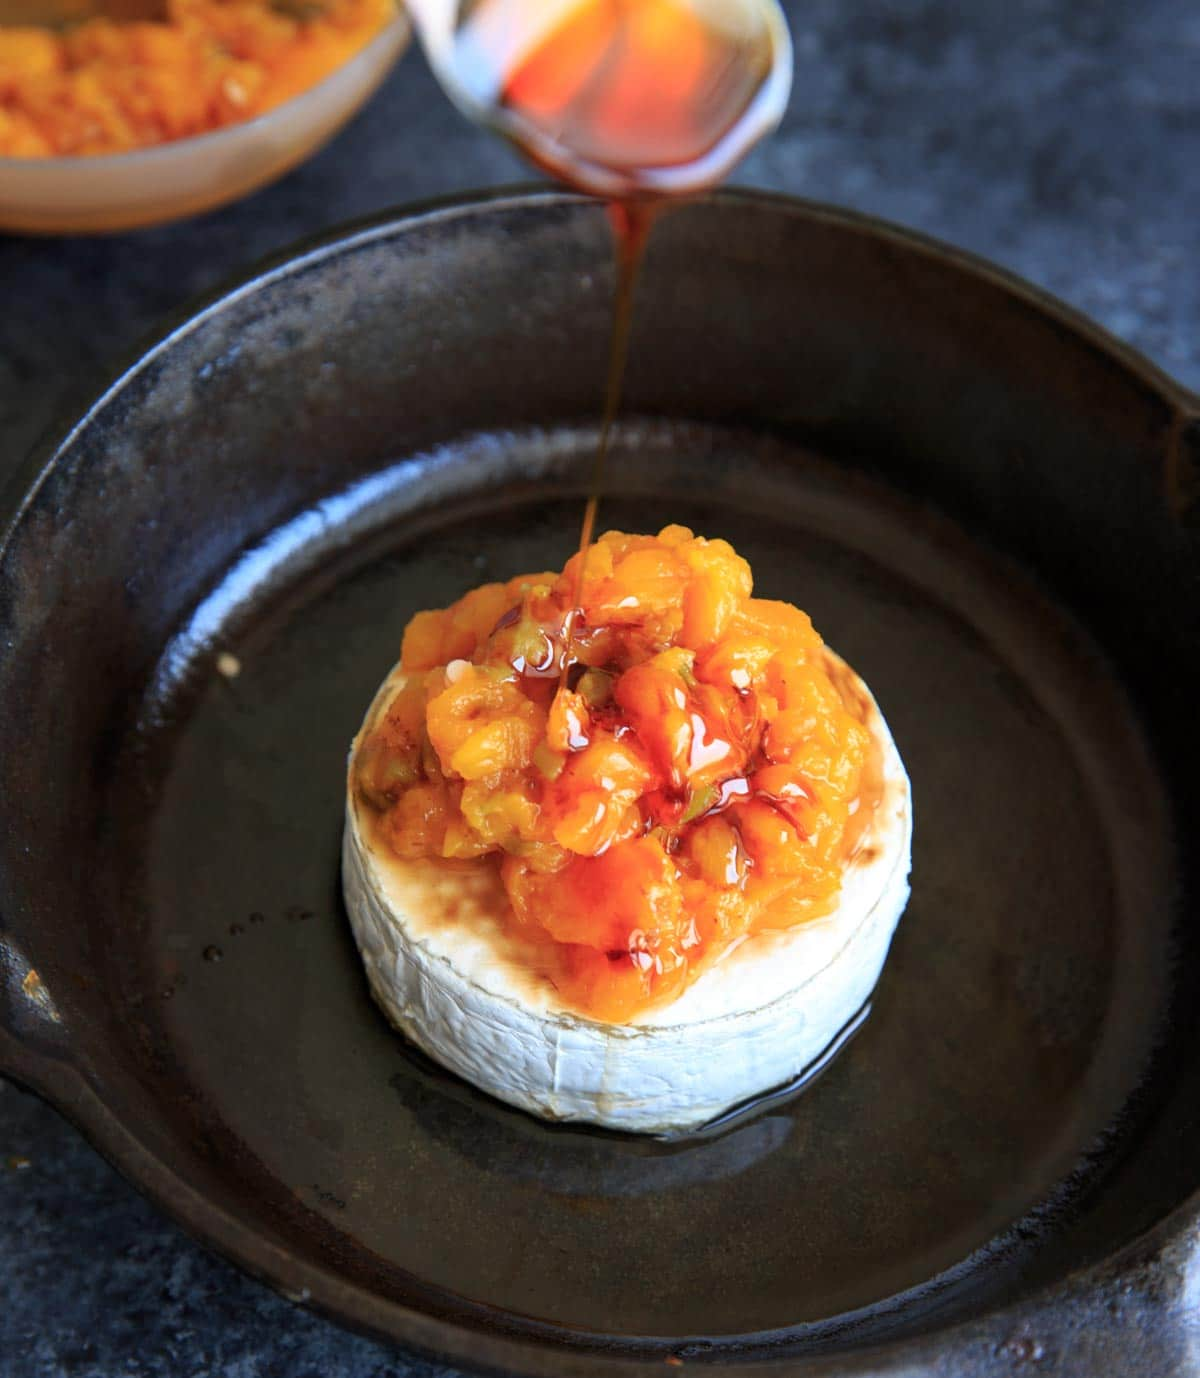 Peach Jalapeno Honey Baked Brie - adding honey